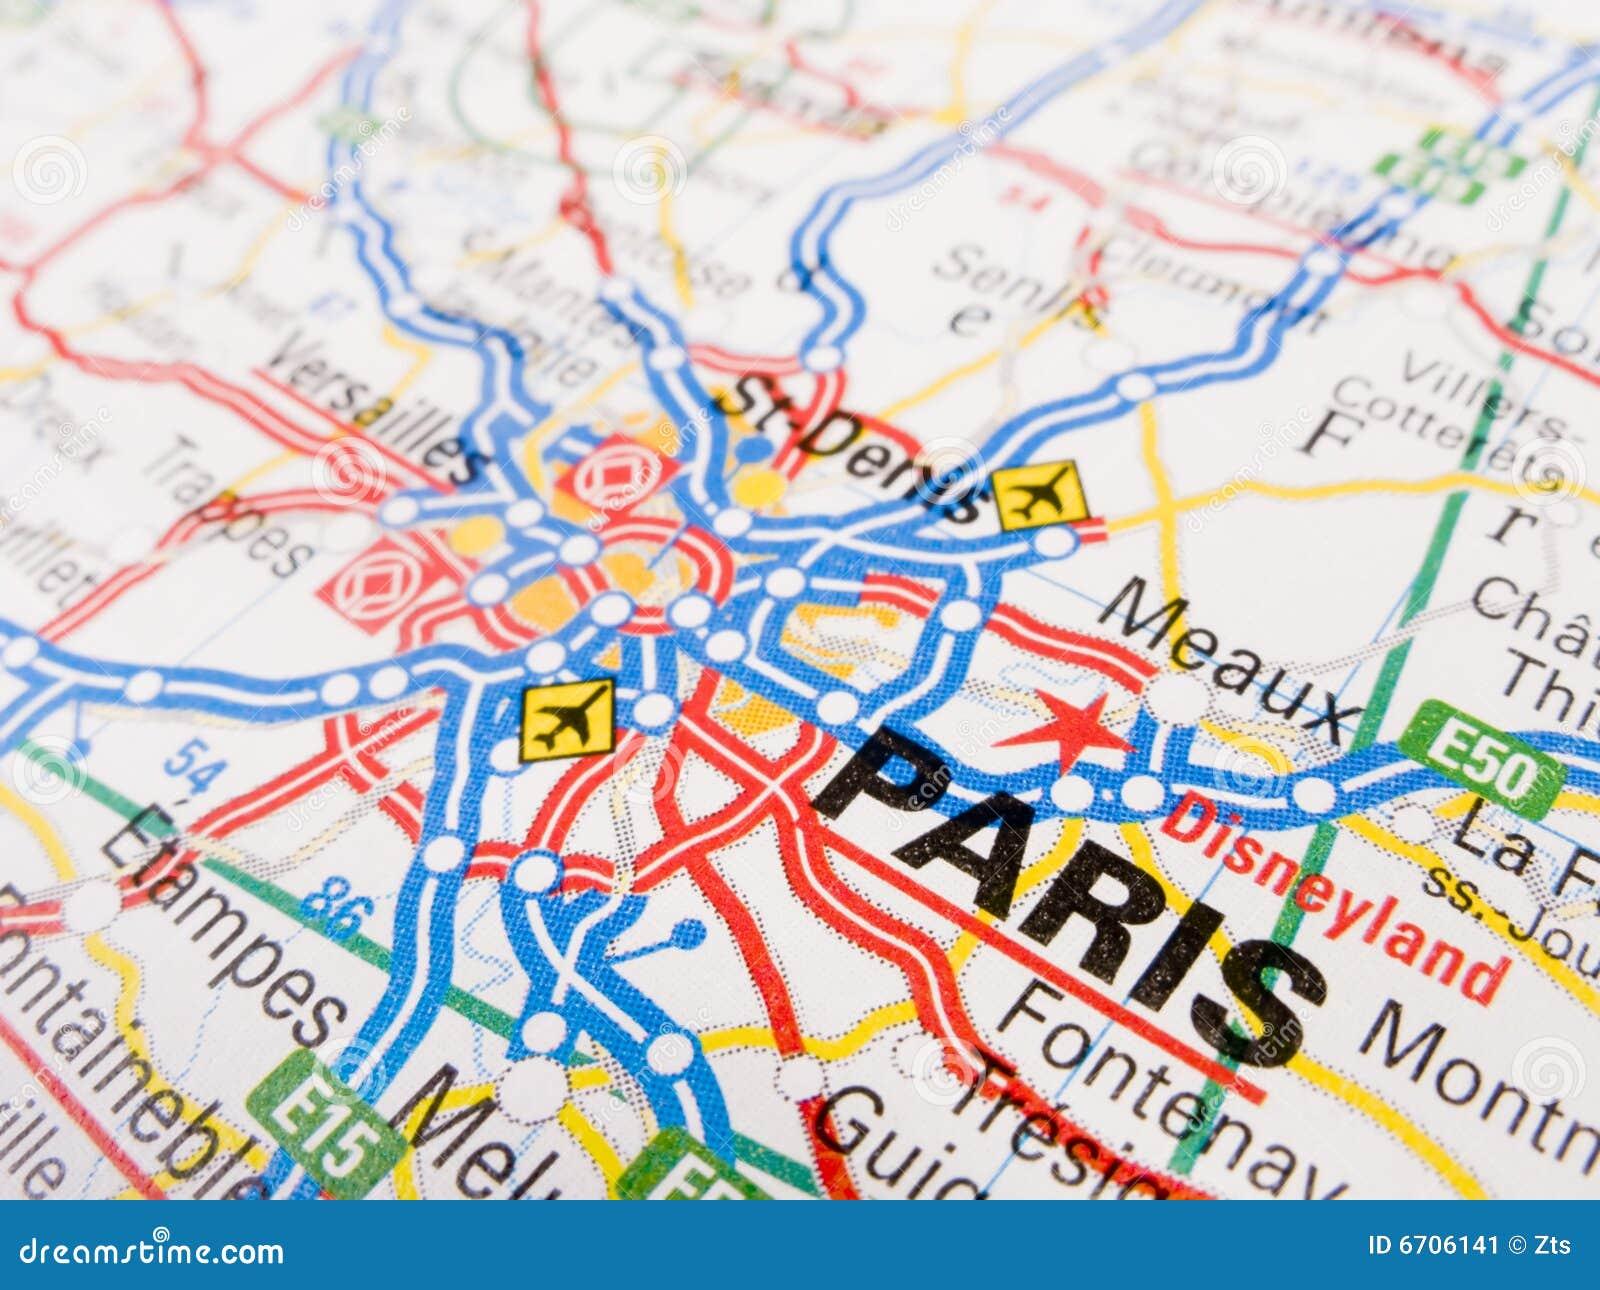 Old paris street map royalty free stock photo image 15885665 - Map Of Paris Stock Image Map Of Paris Old Street Map Of New York City Royalty Free